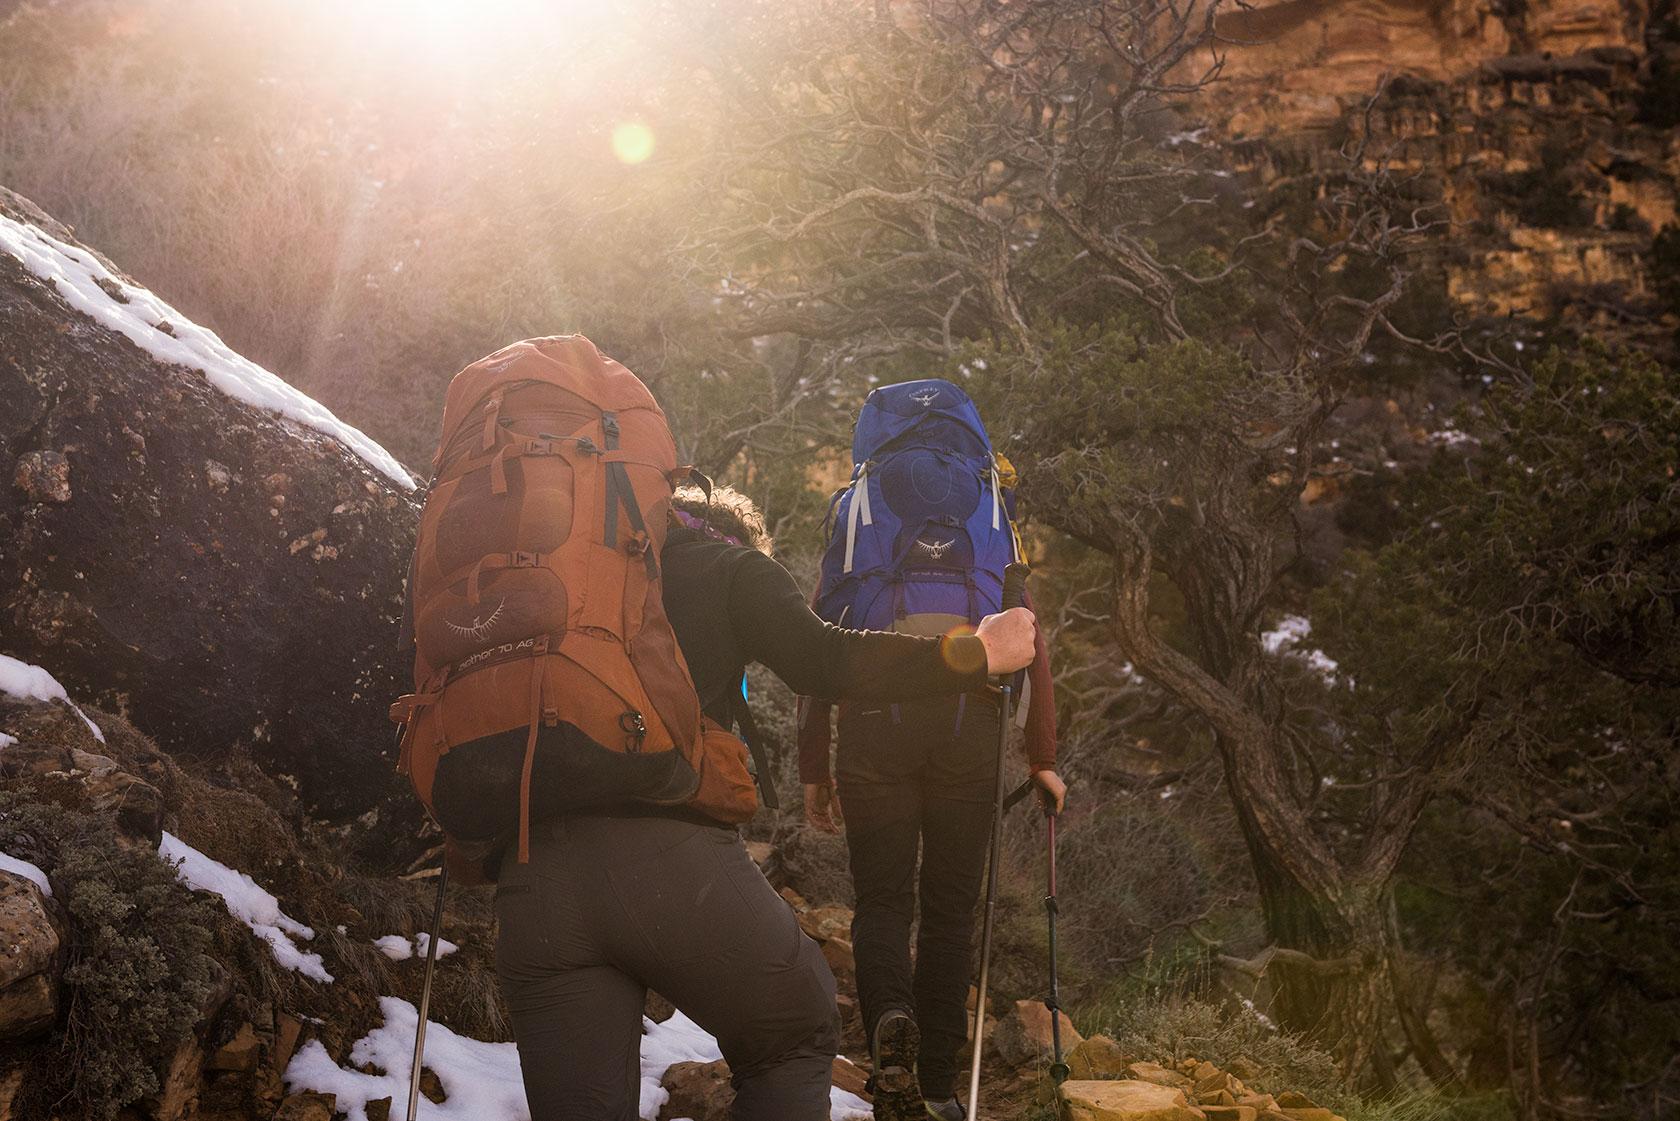 austin-trigg-osprey-hiking-backpacks-grand-canyon-osprey-pack-bag-arizona-hike-camp-sun-flare-tree-trail-afternoon.jpg